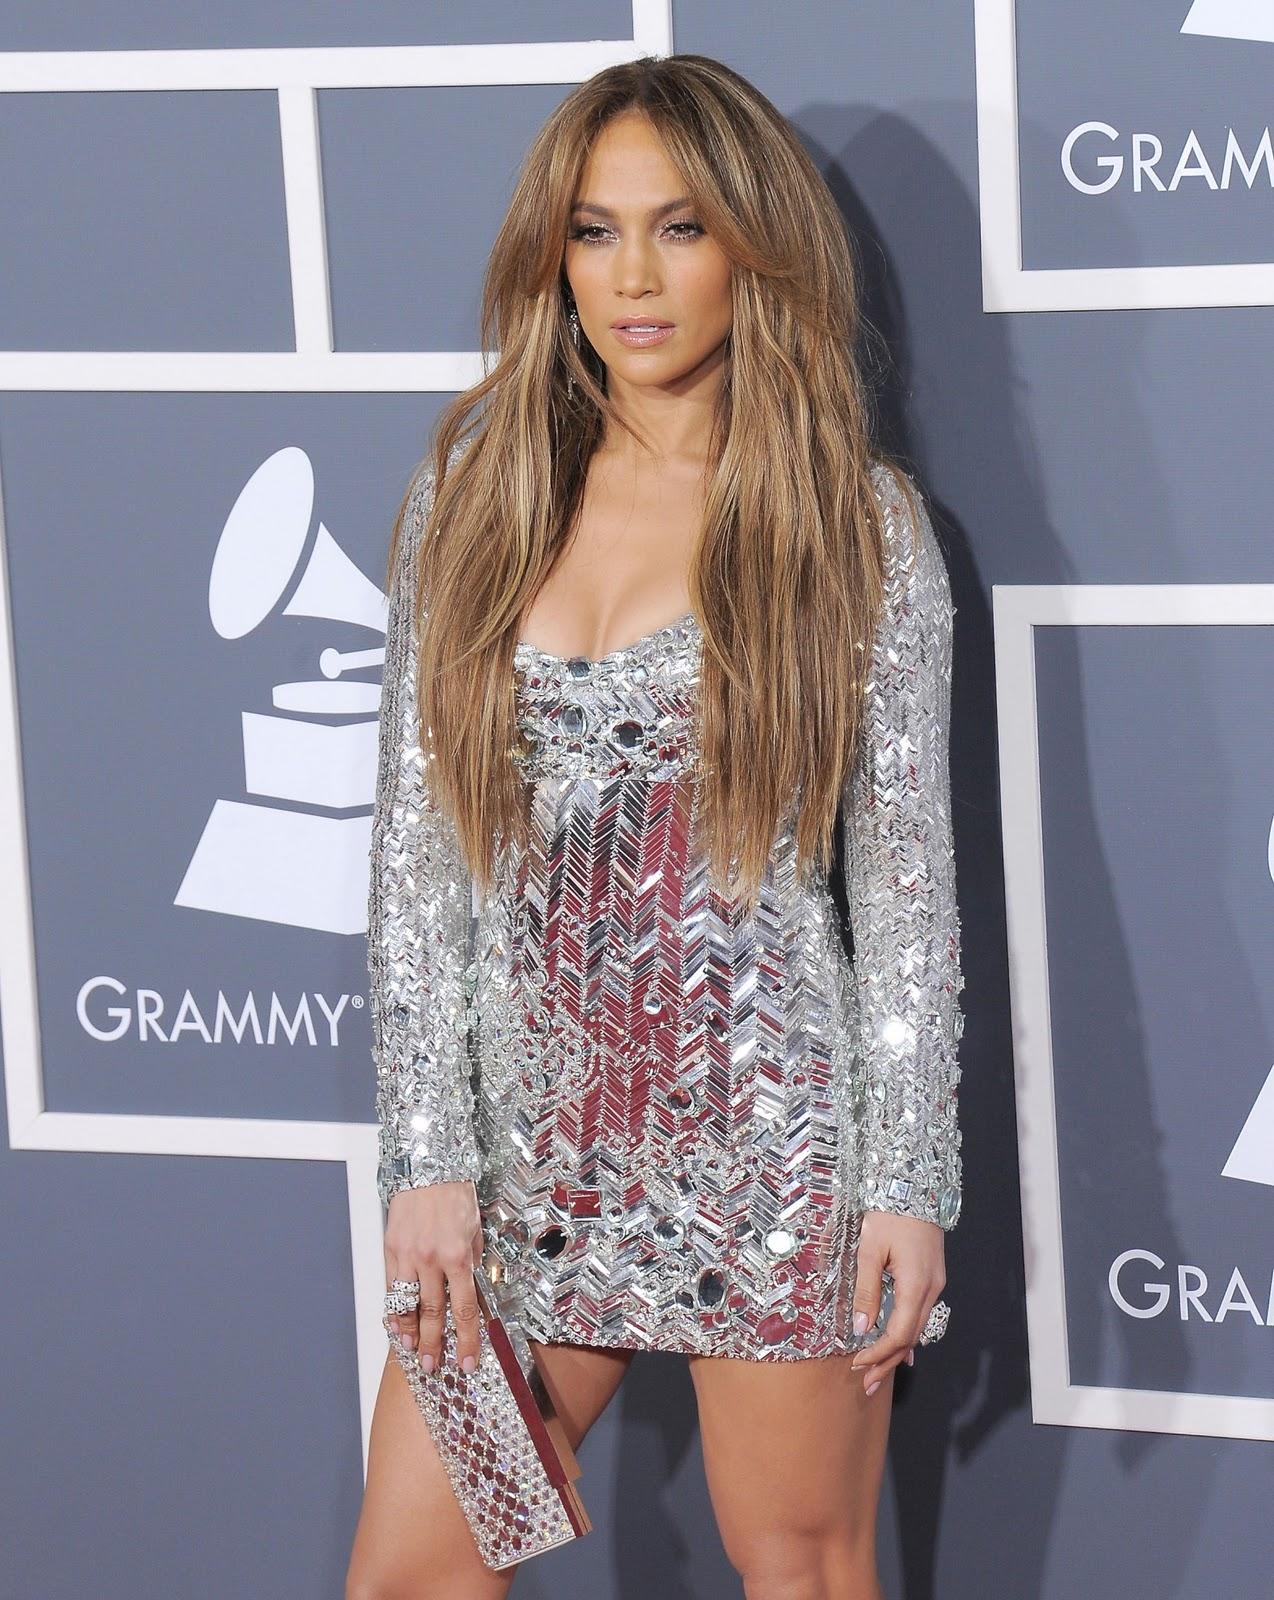 http://3.bp.blogspot.com/-sZvEY-hJWyY/TVlZm_dkTzI/AAAAAAAAEEA/ugxCc2bcjhY/s1600/Jennifer-Lopez-16.jpg